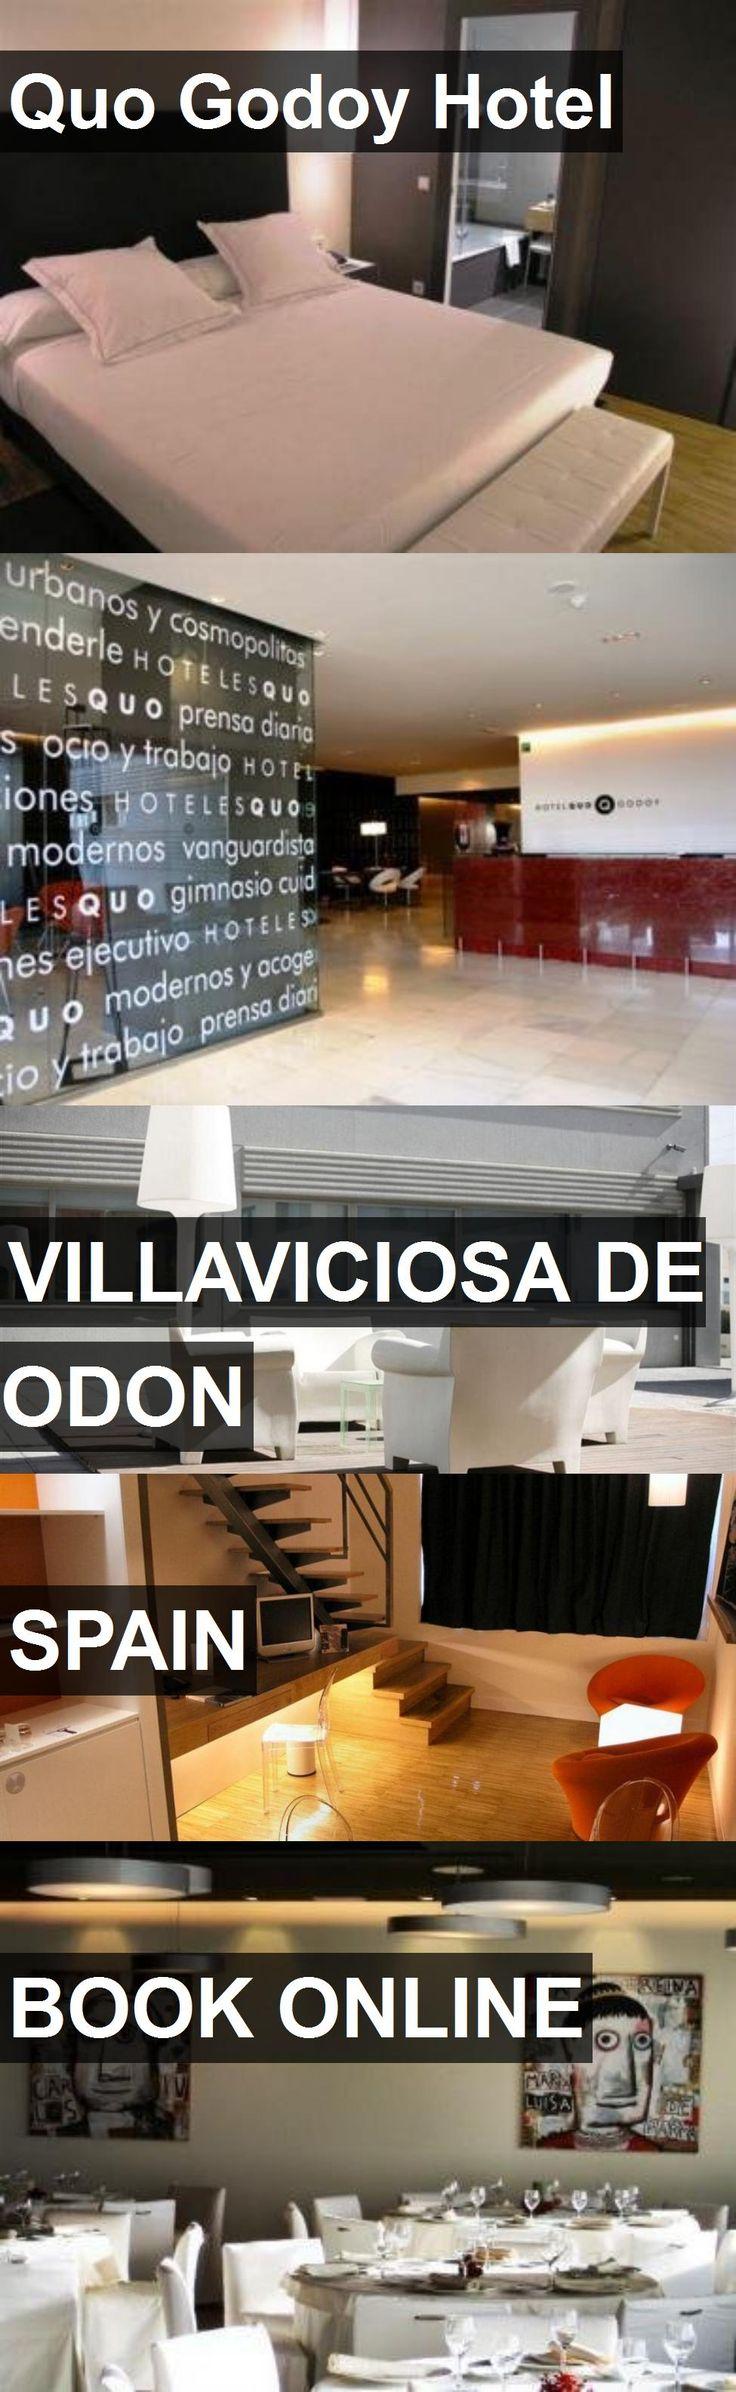 Hotel Quo Godoy Hotel in Villaviciosa de Odon, Spain. For more information, photos, reviews and best prices please follow the link. #Spain #VillaviciosadeOdon #QuoGodoyHotel #hotel #travel #vacation